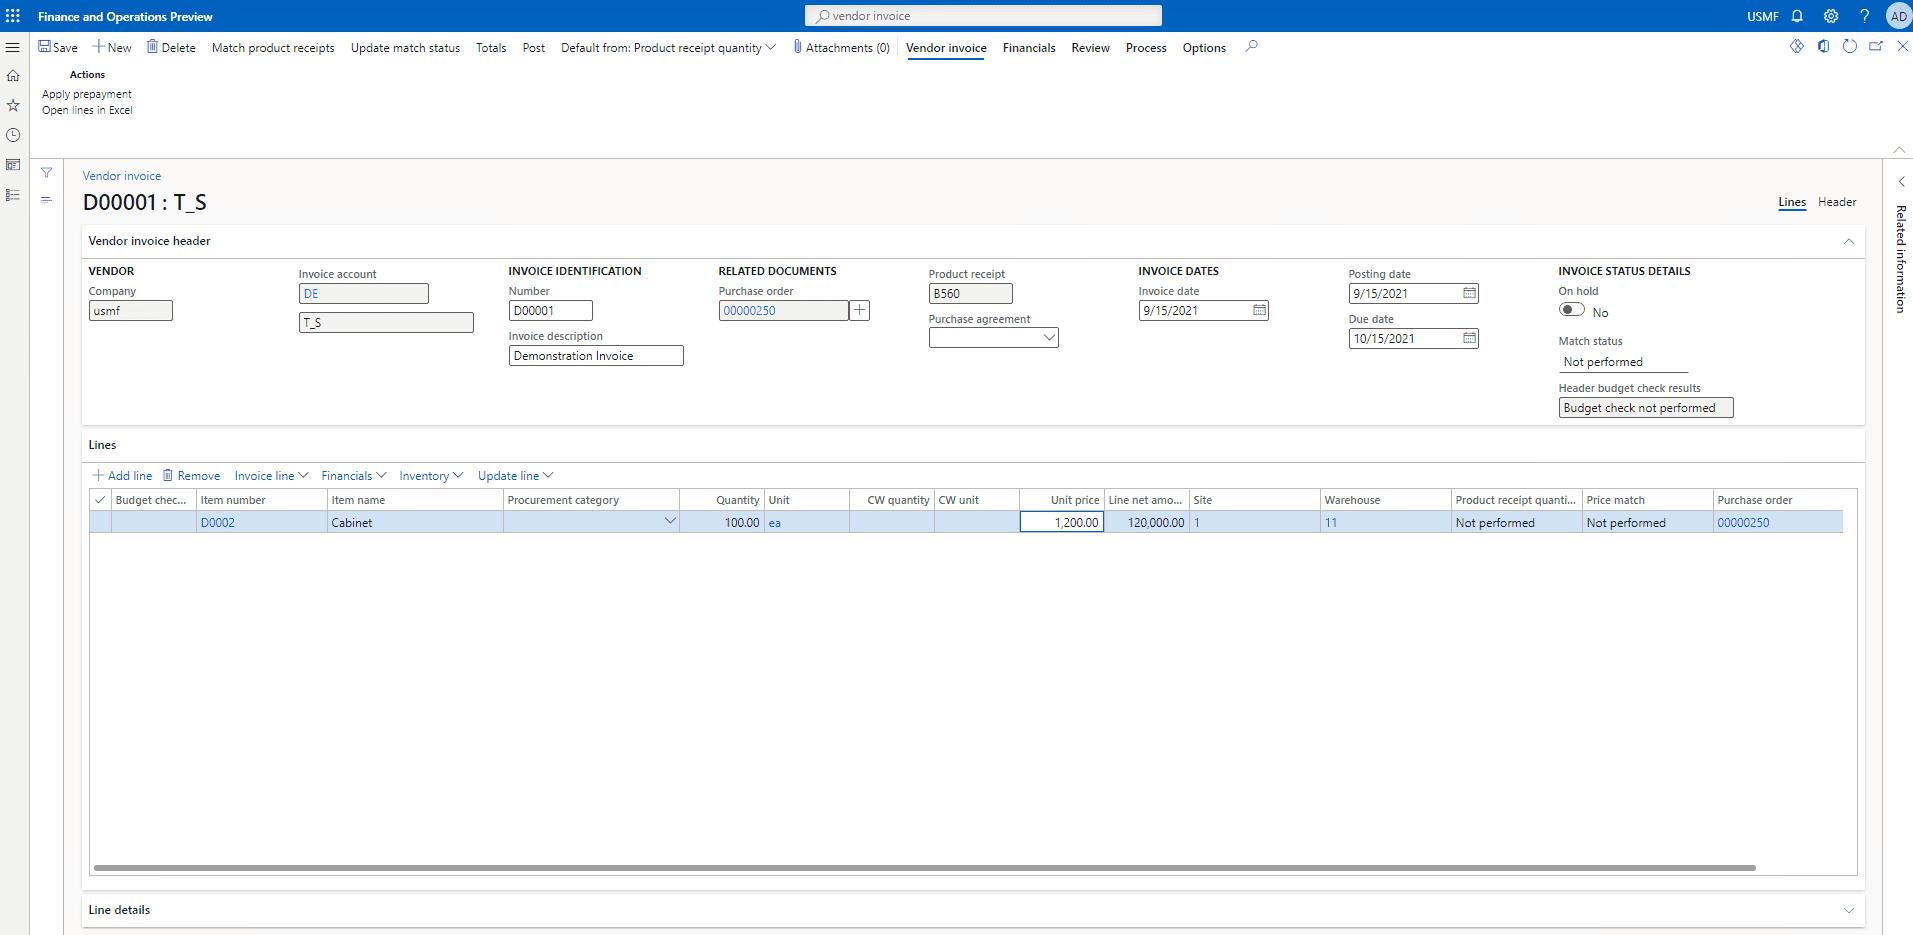 vendor invoice form